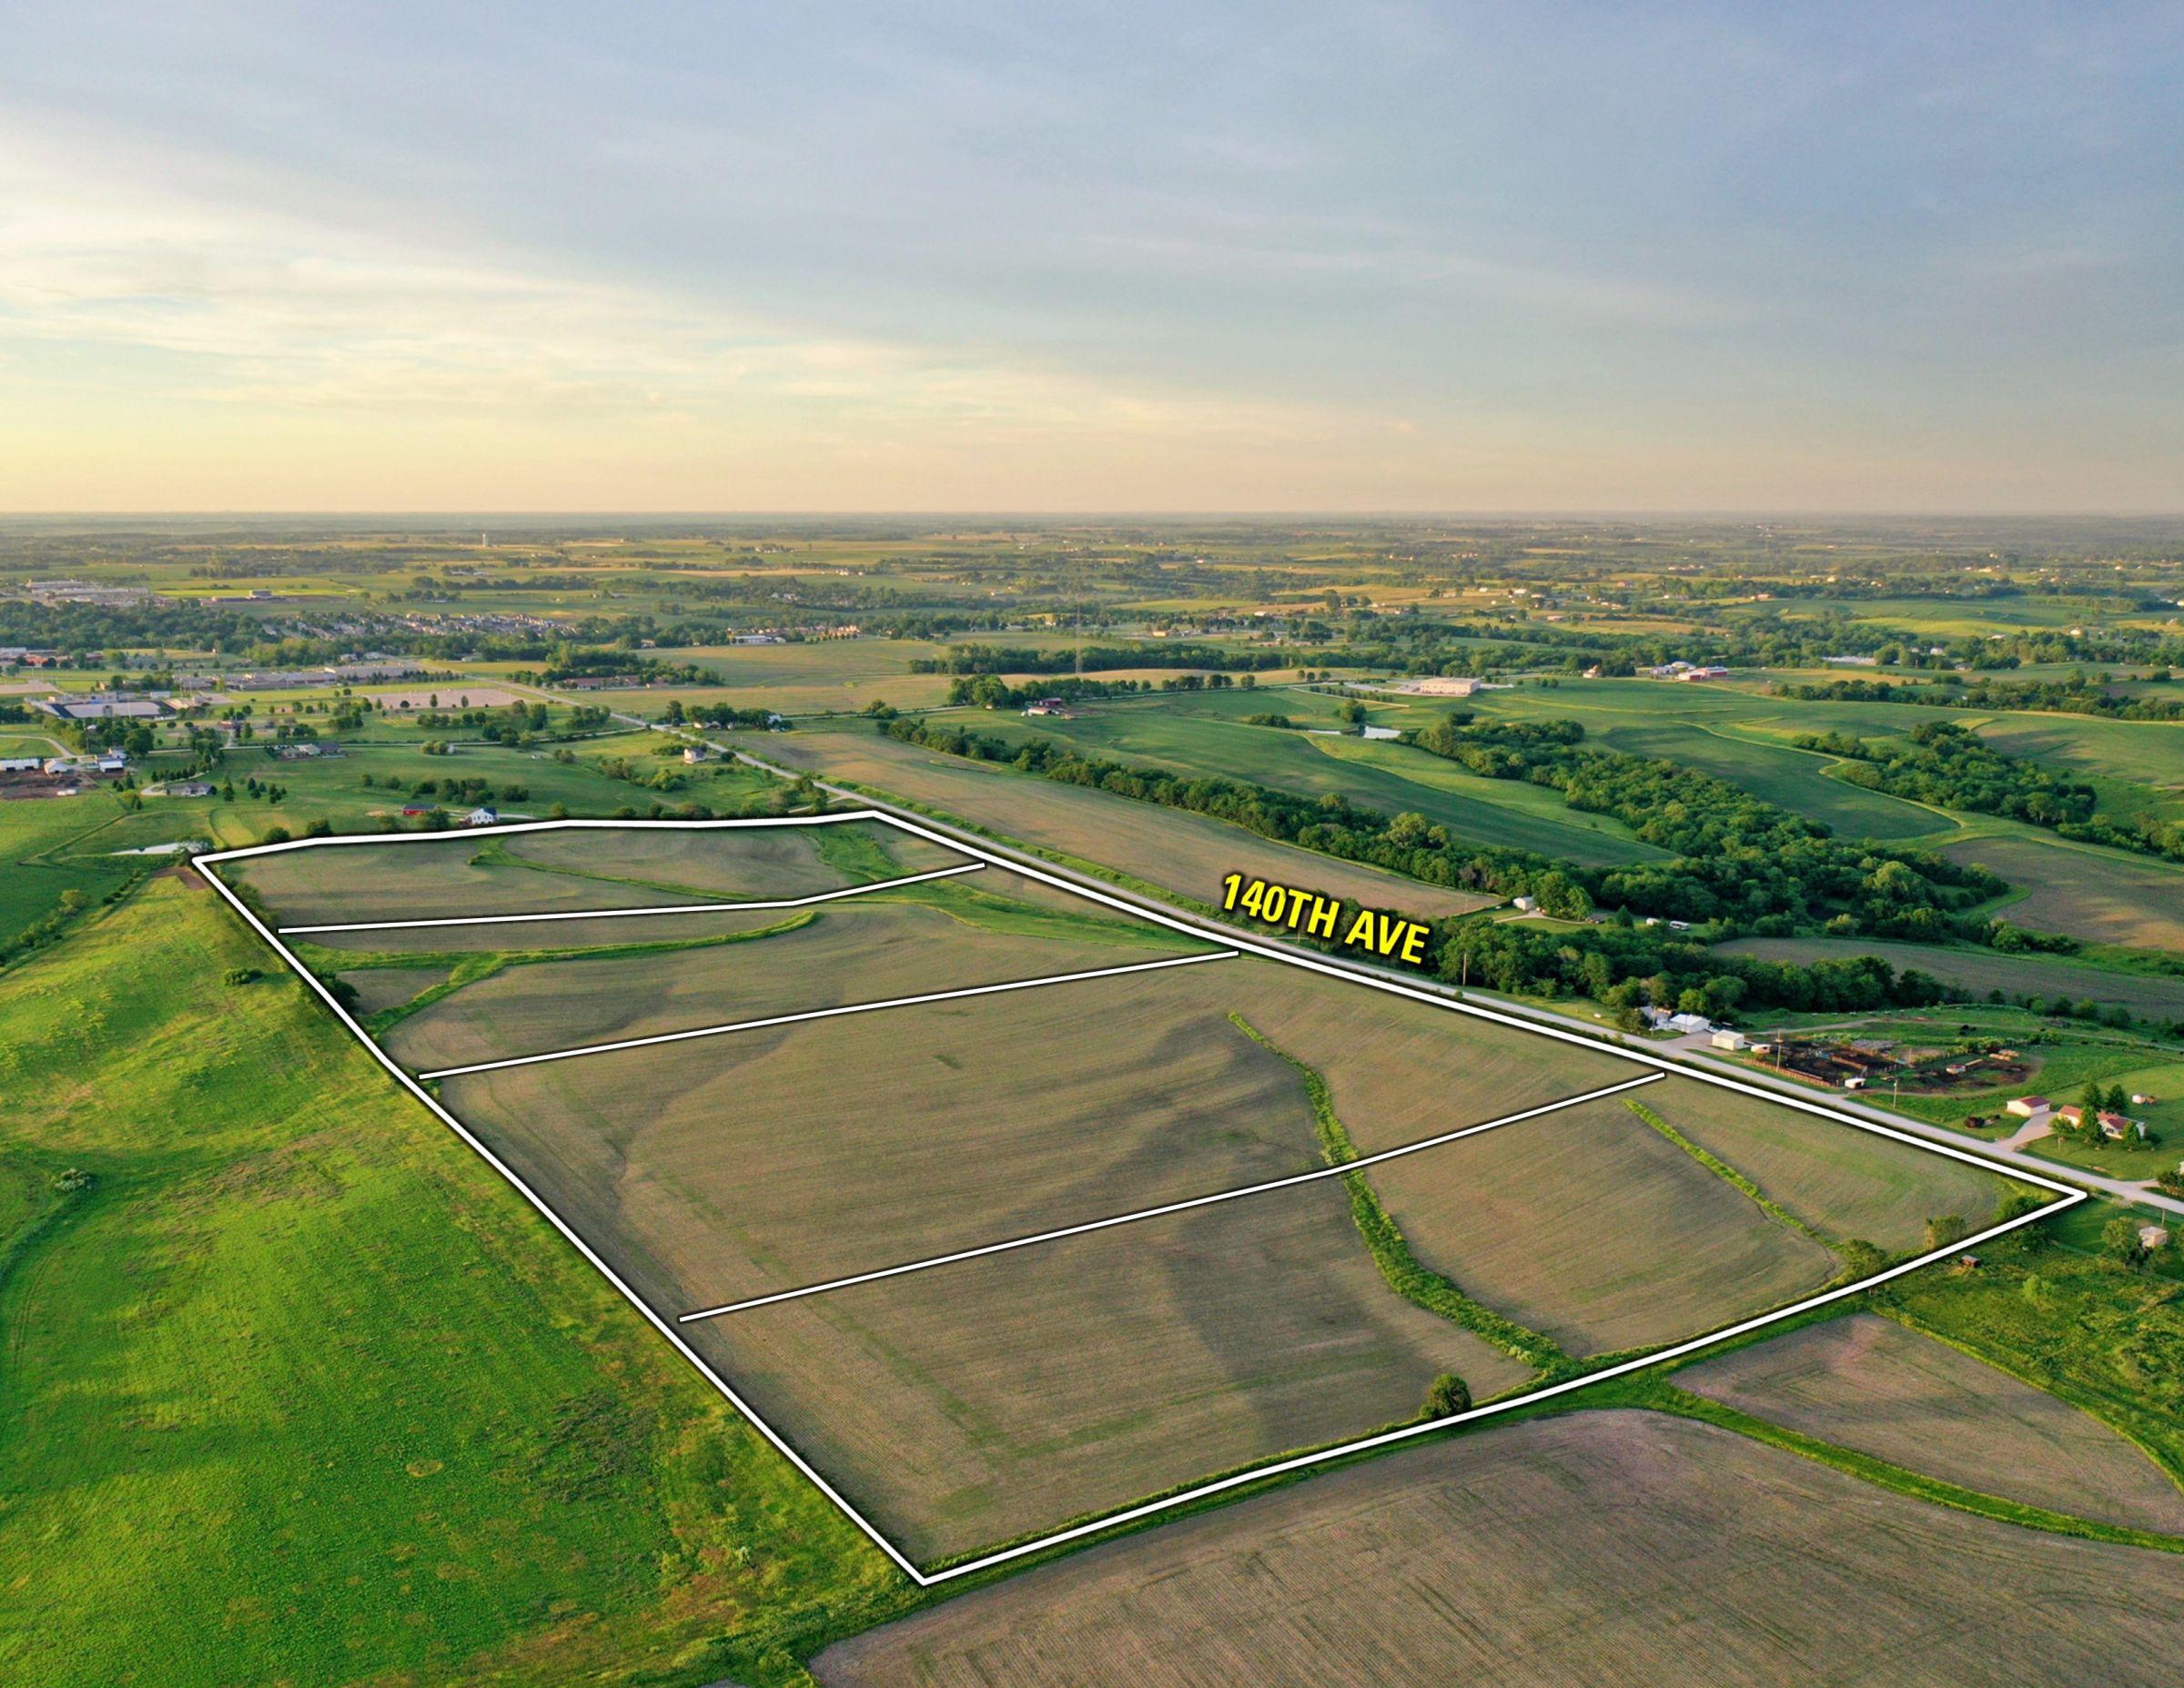 development-land-warren-county-iowa-20-acres-listing-number-15425-2-2021-03-26-185350.jpg